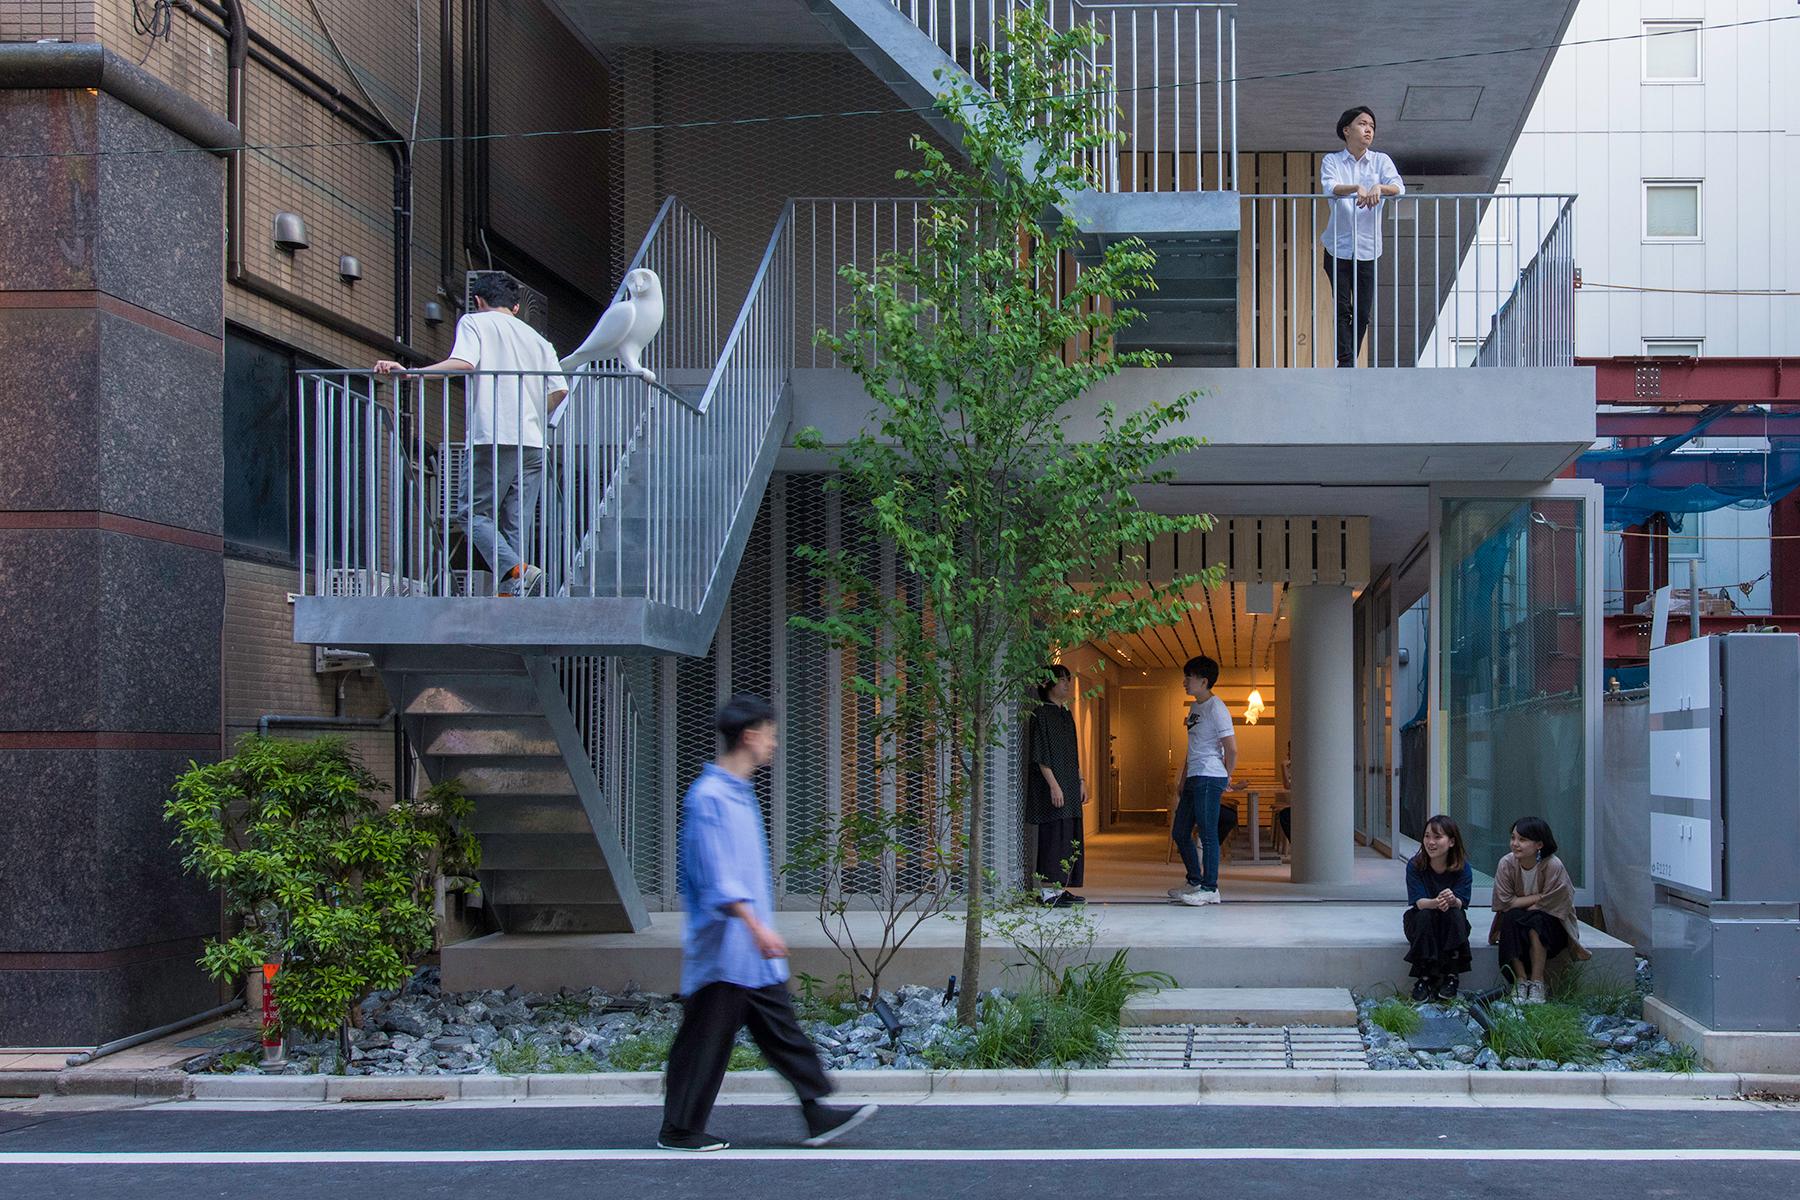 Hotel Siro / MOUNT FUJI ARCHITECTS STUDIO